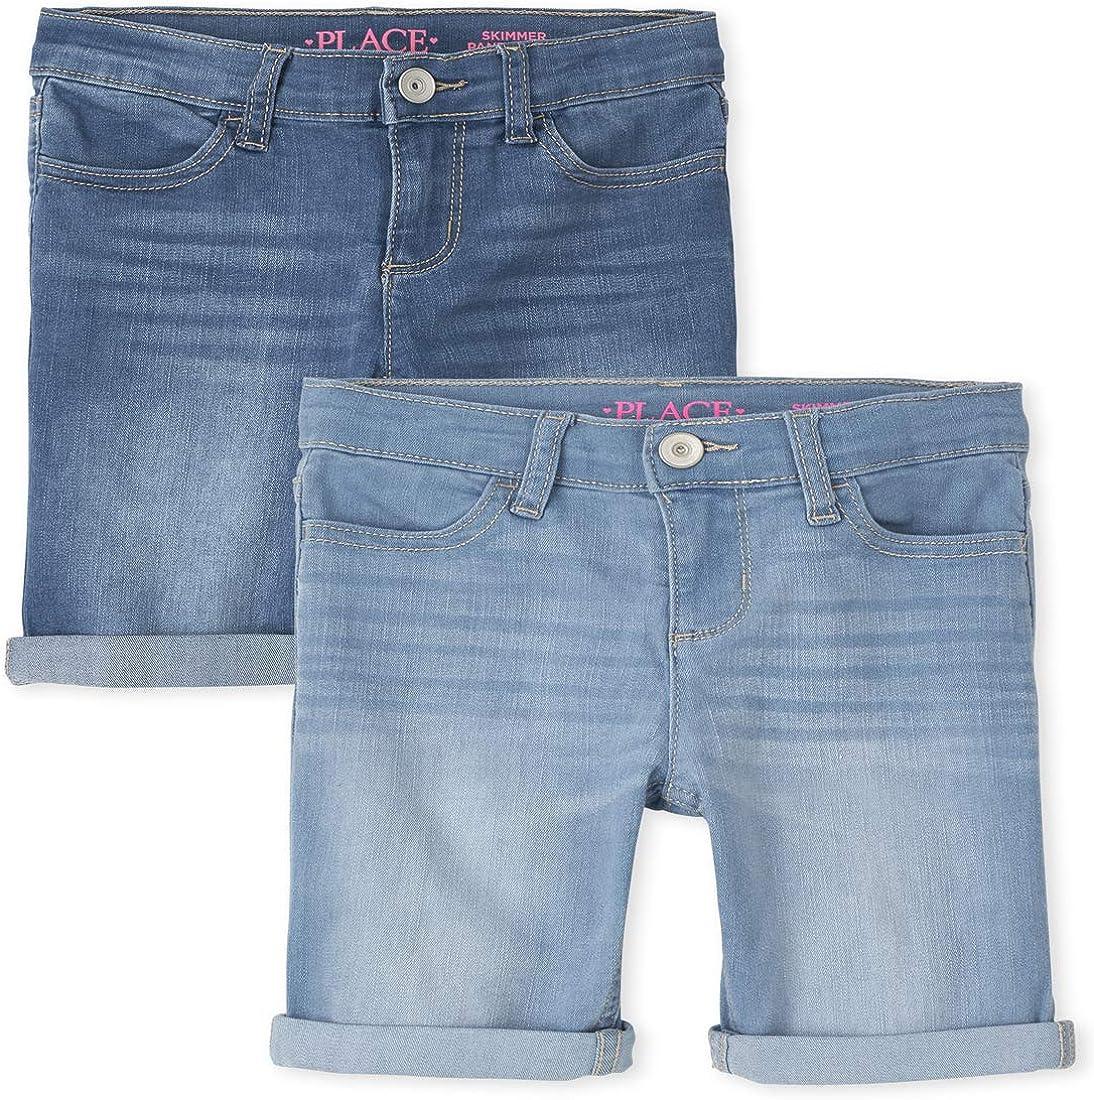 The half Children's Place Girls Roll Cuff 2-Pack Skimmer 2021 model Denim Shorts